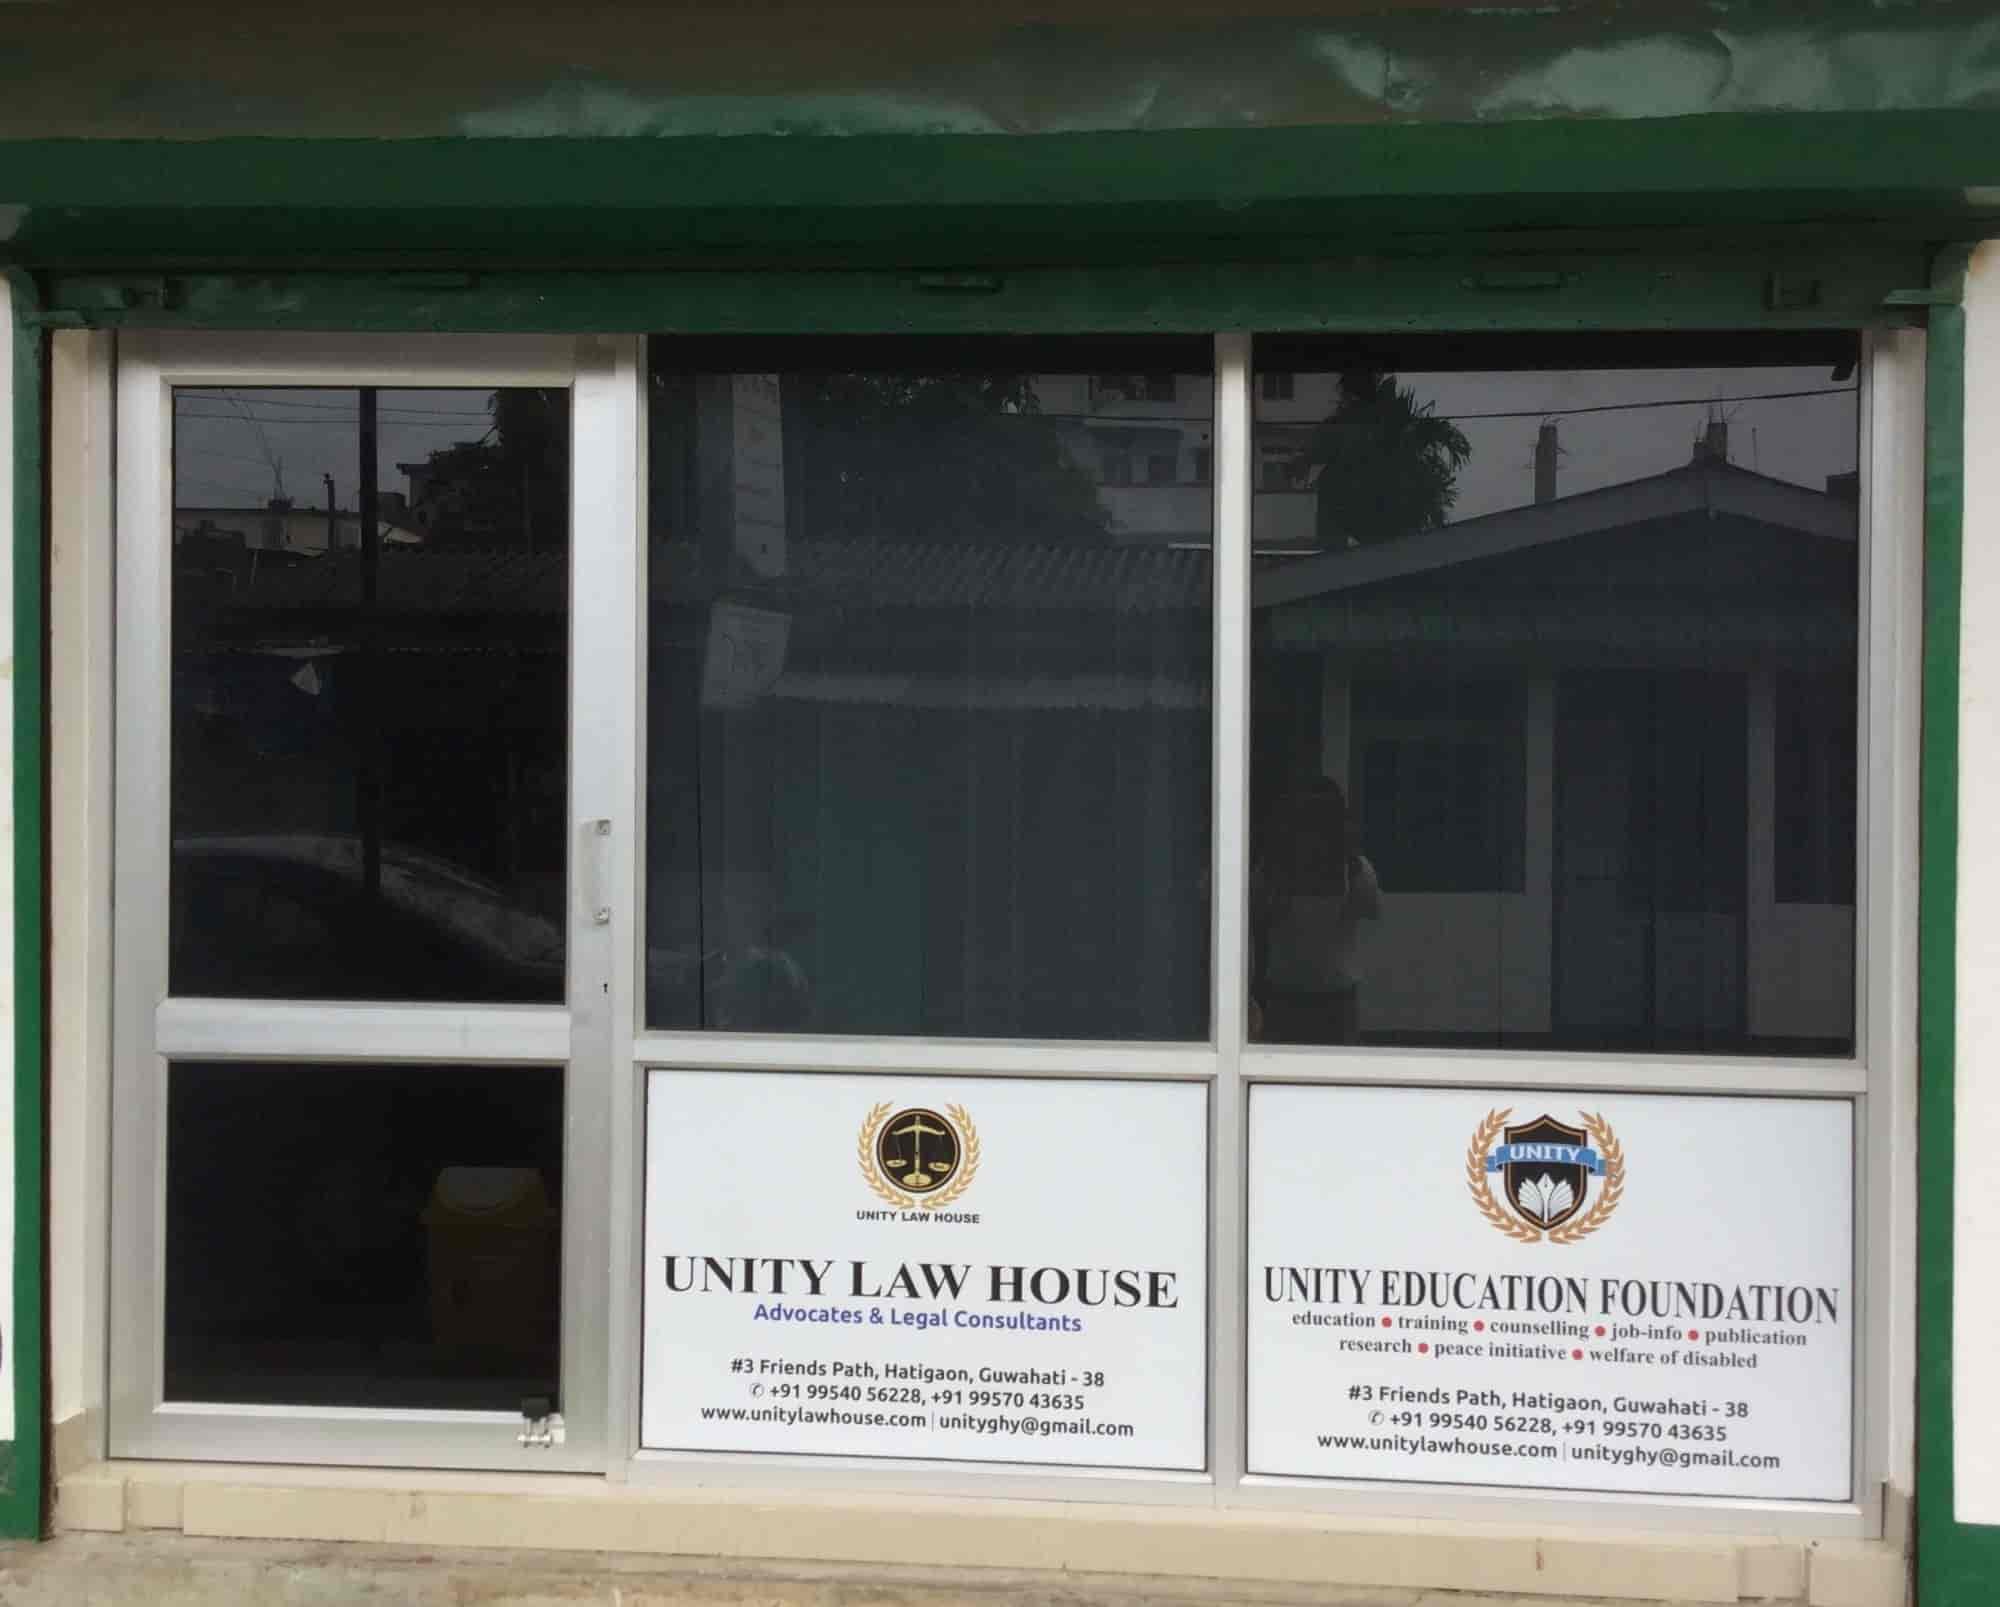 Unity Law House, Hatigaon - Lawyers in Guwahati - Justdial